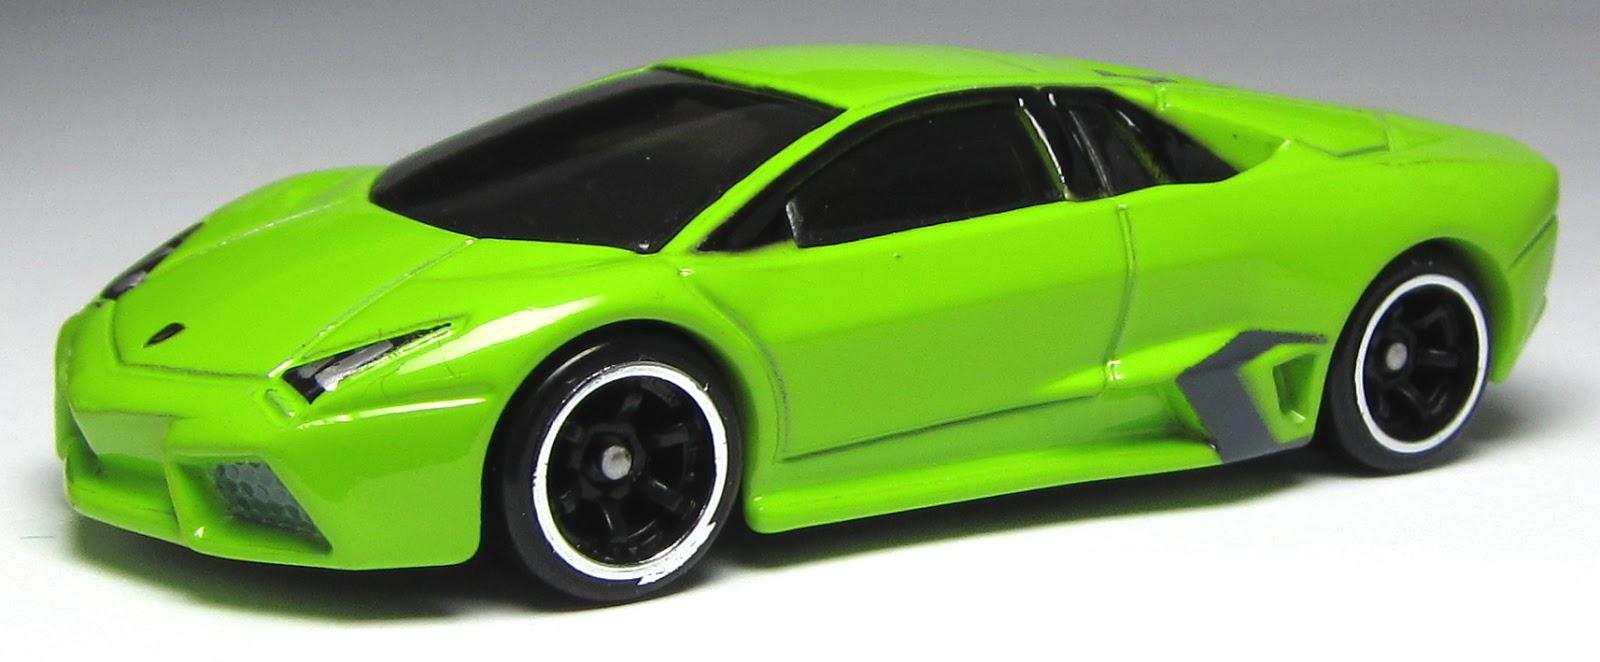 lamborghini reventon green